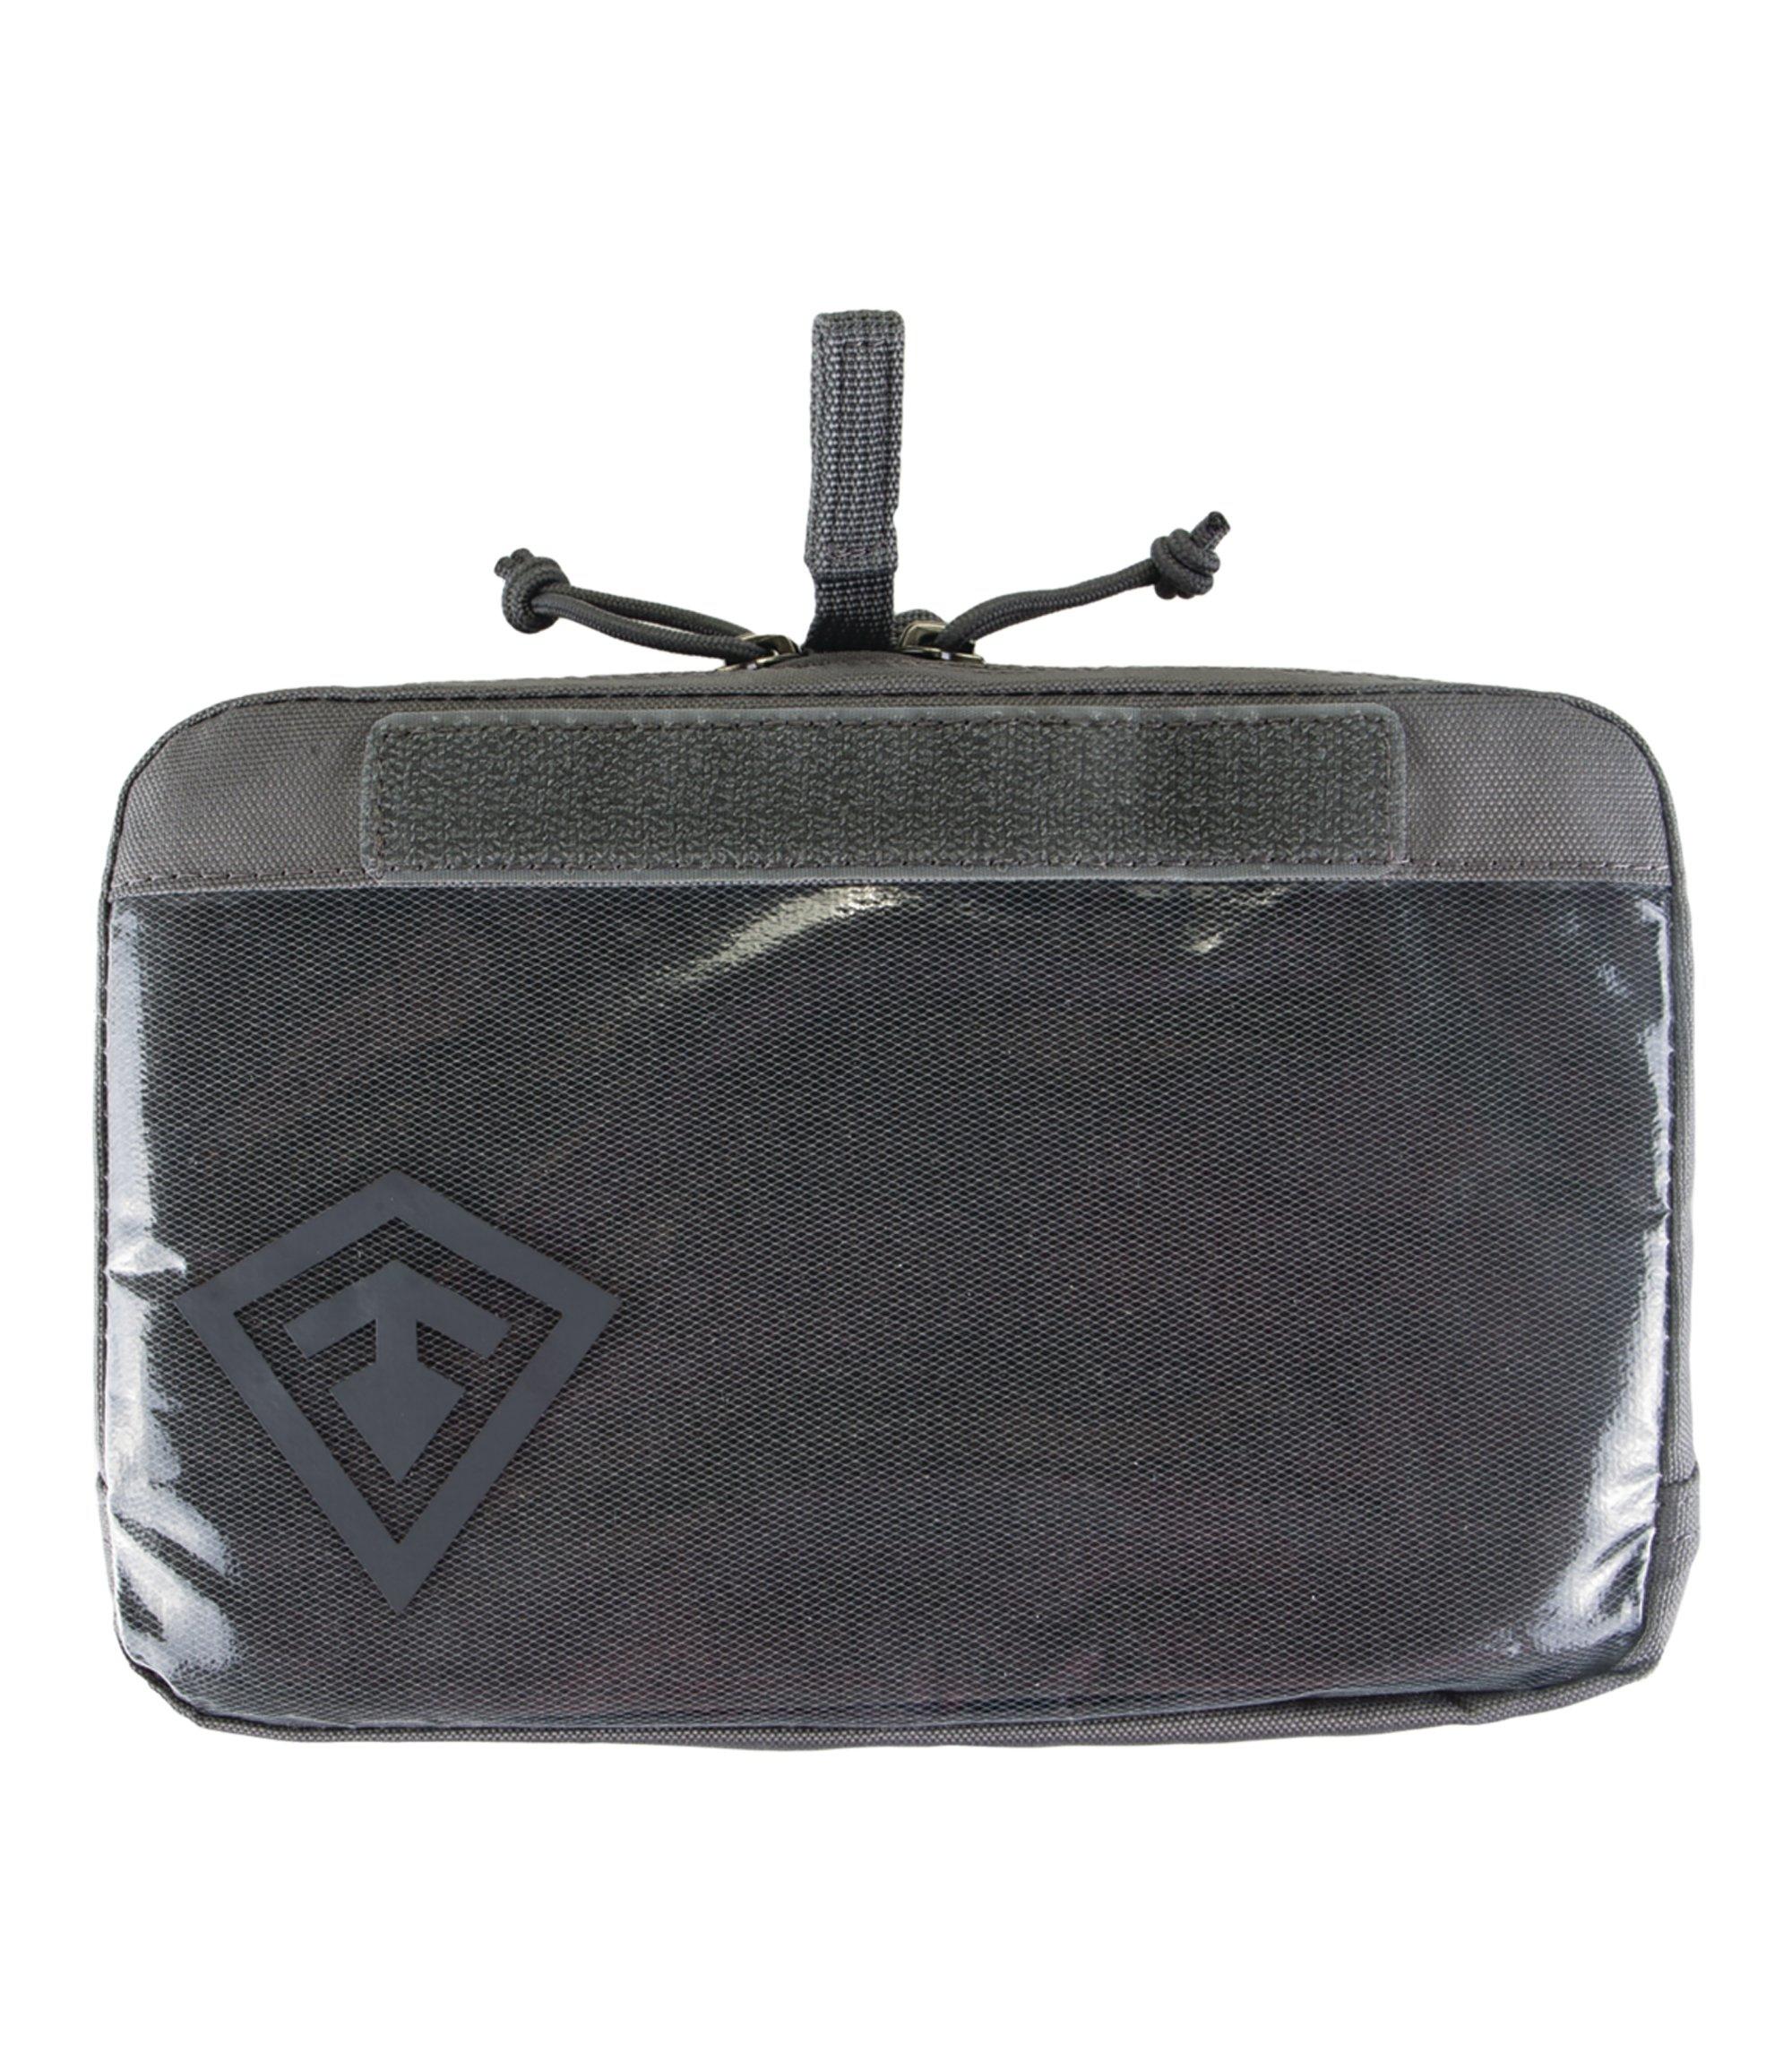 Image of Futerał first tactical 6x10 velcro pouch 180034 (u1t/180034 015)